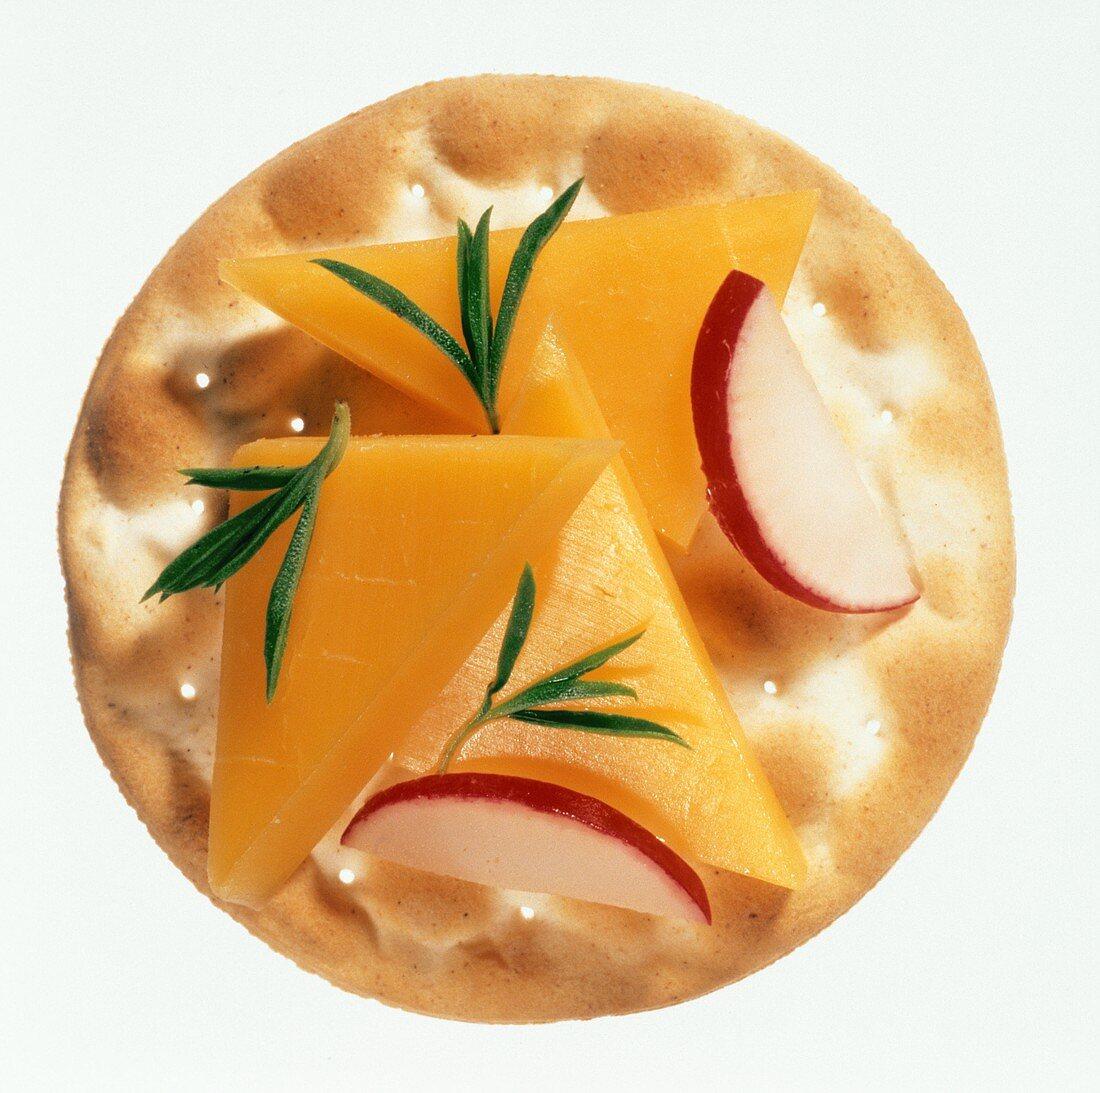 Cracker with Cheese and Radish